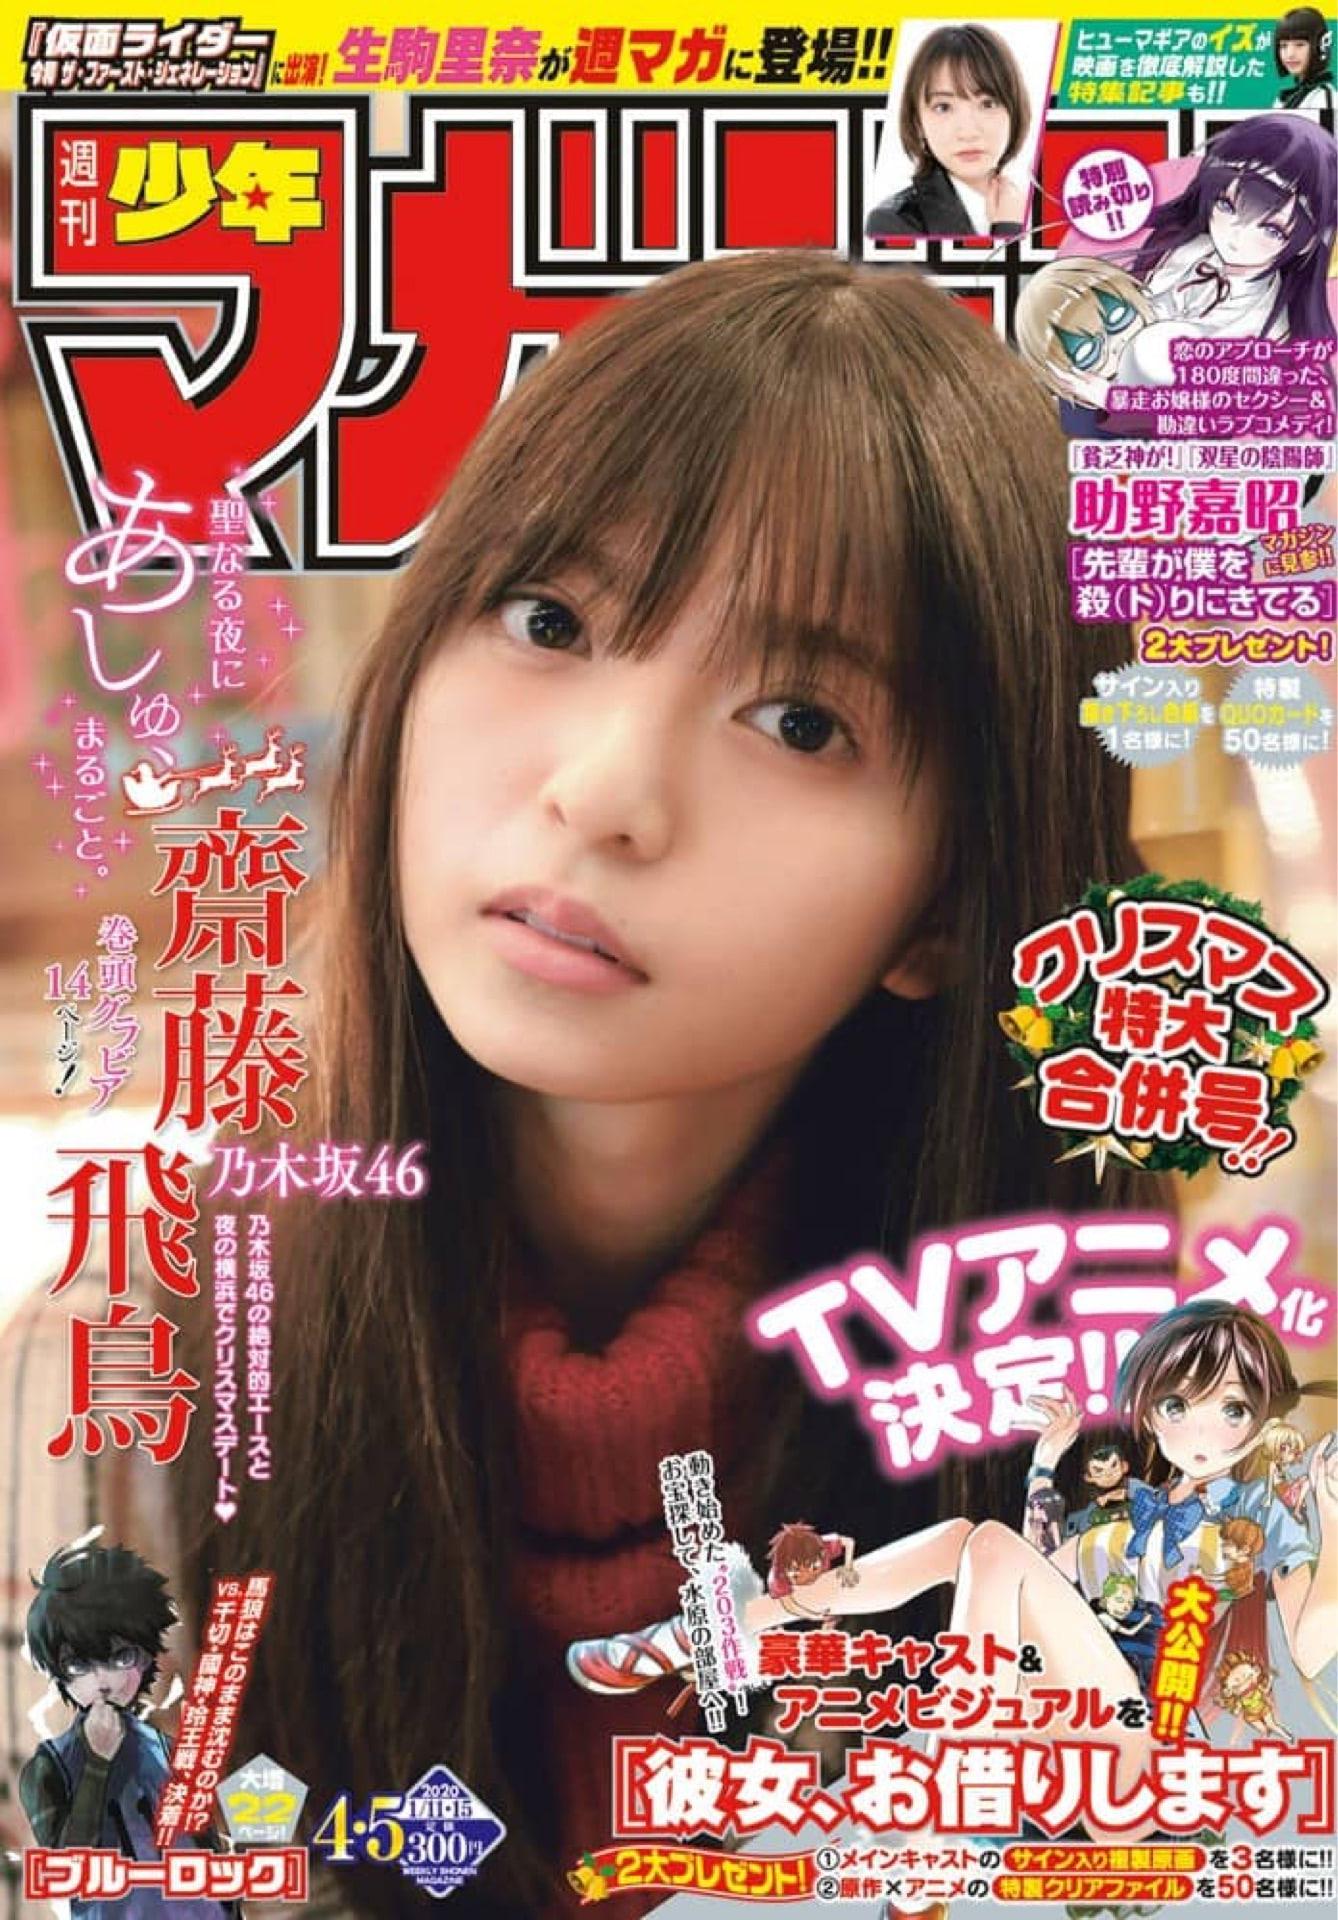 週刊少年マガジン 2020年01月15日号 4-5号 乃木坂46 齋藤飛鳥